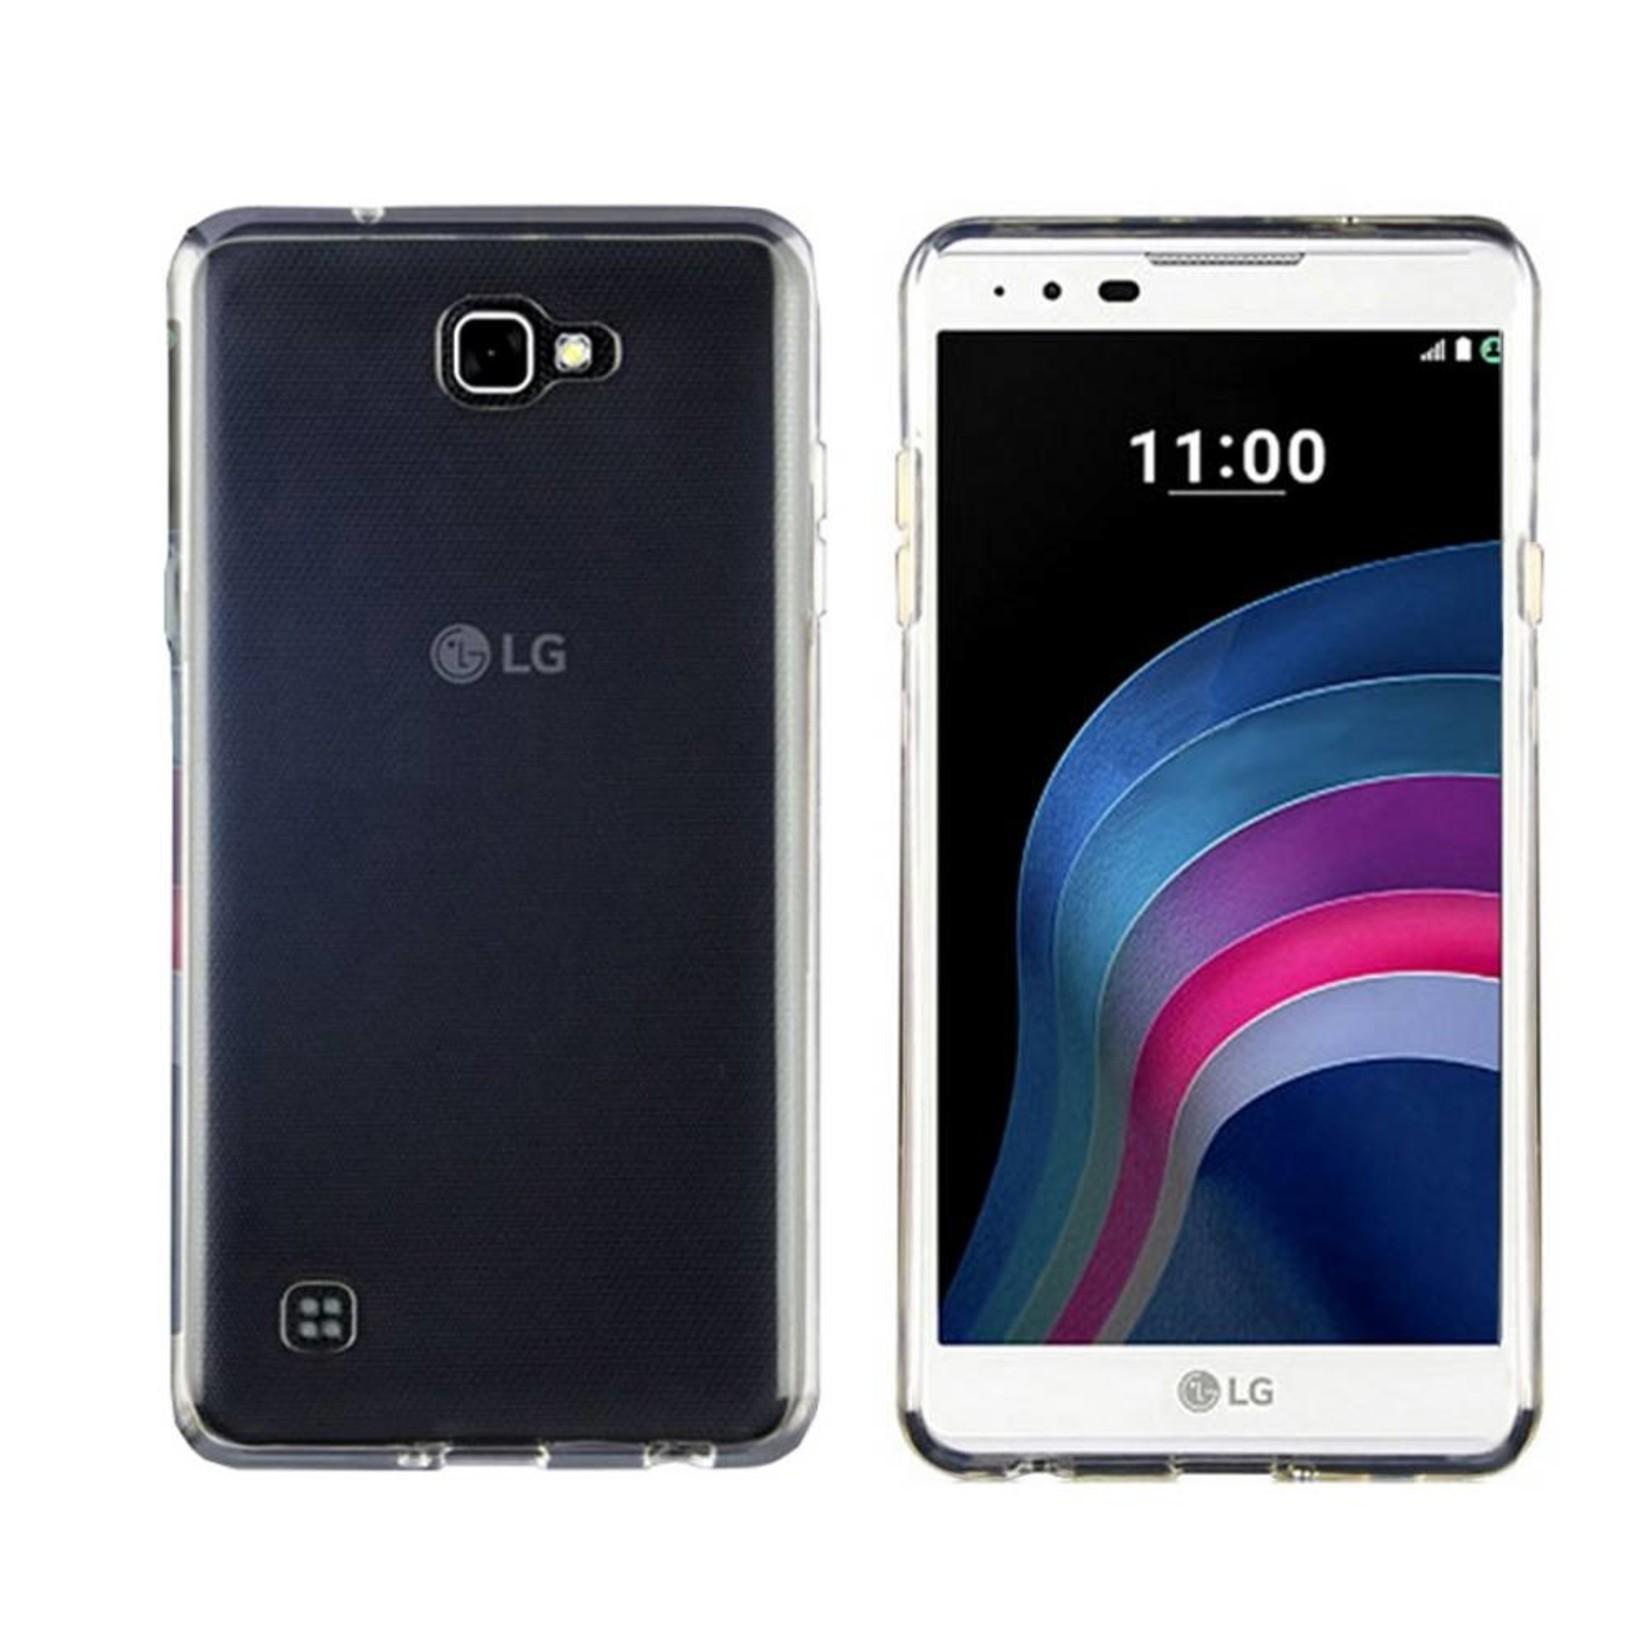 Colorfone Hoesje CoolSkin3T voor LG X5 Tr. Wit